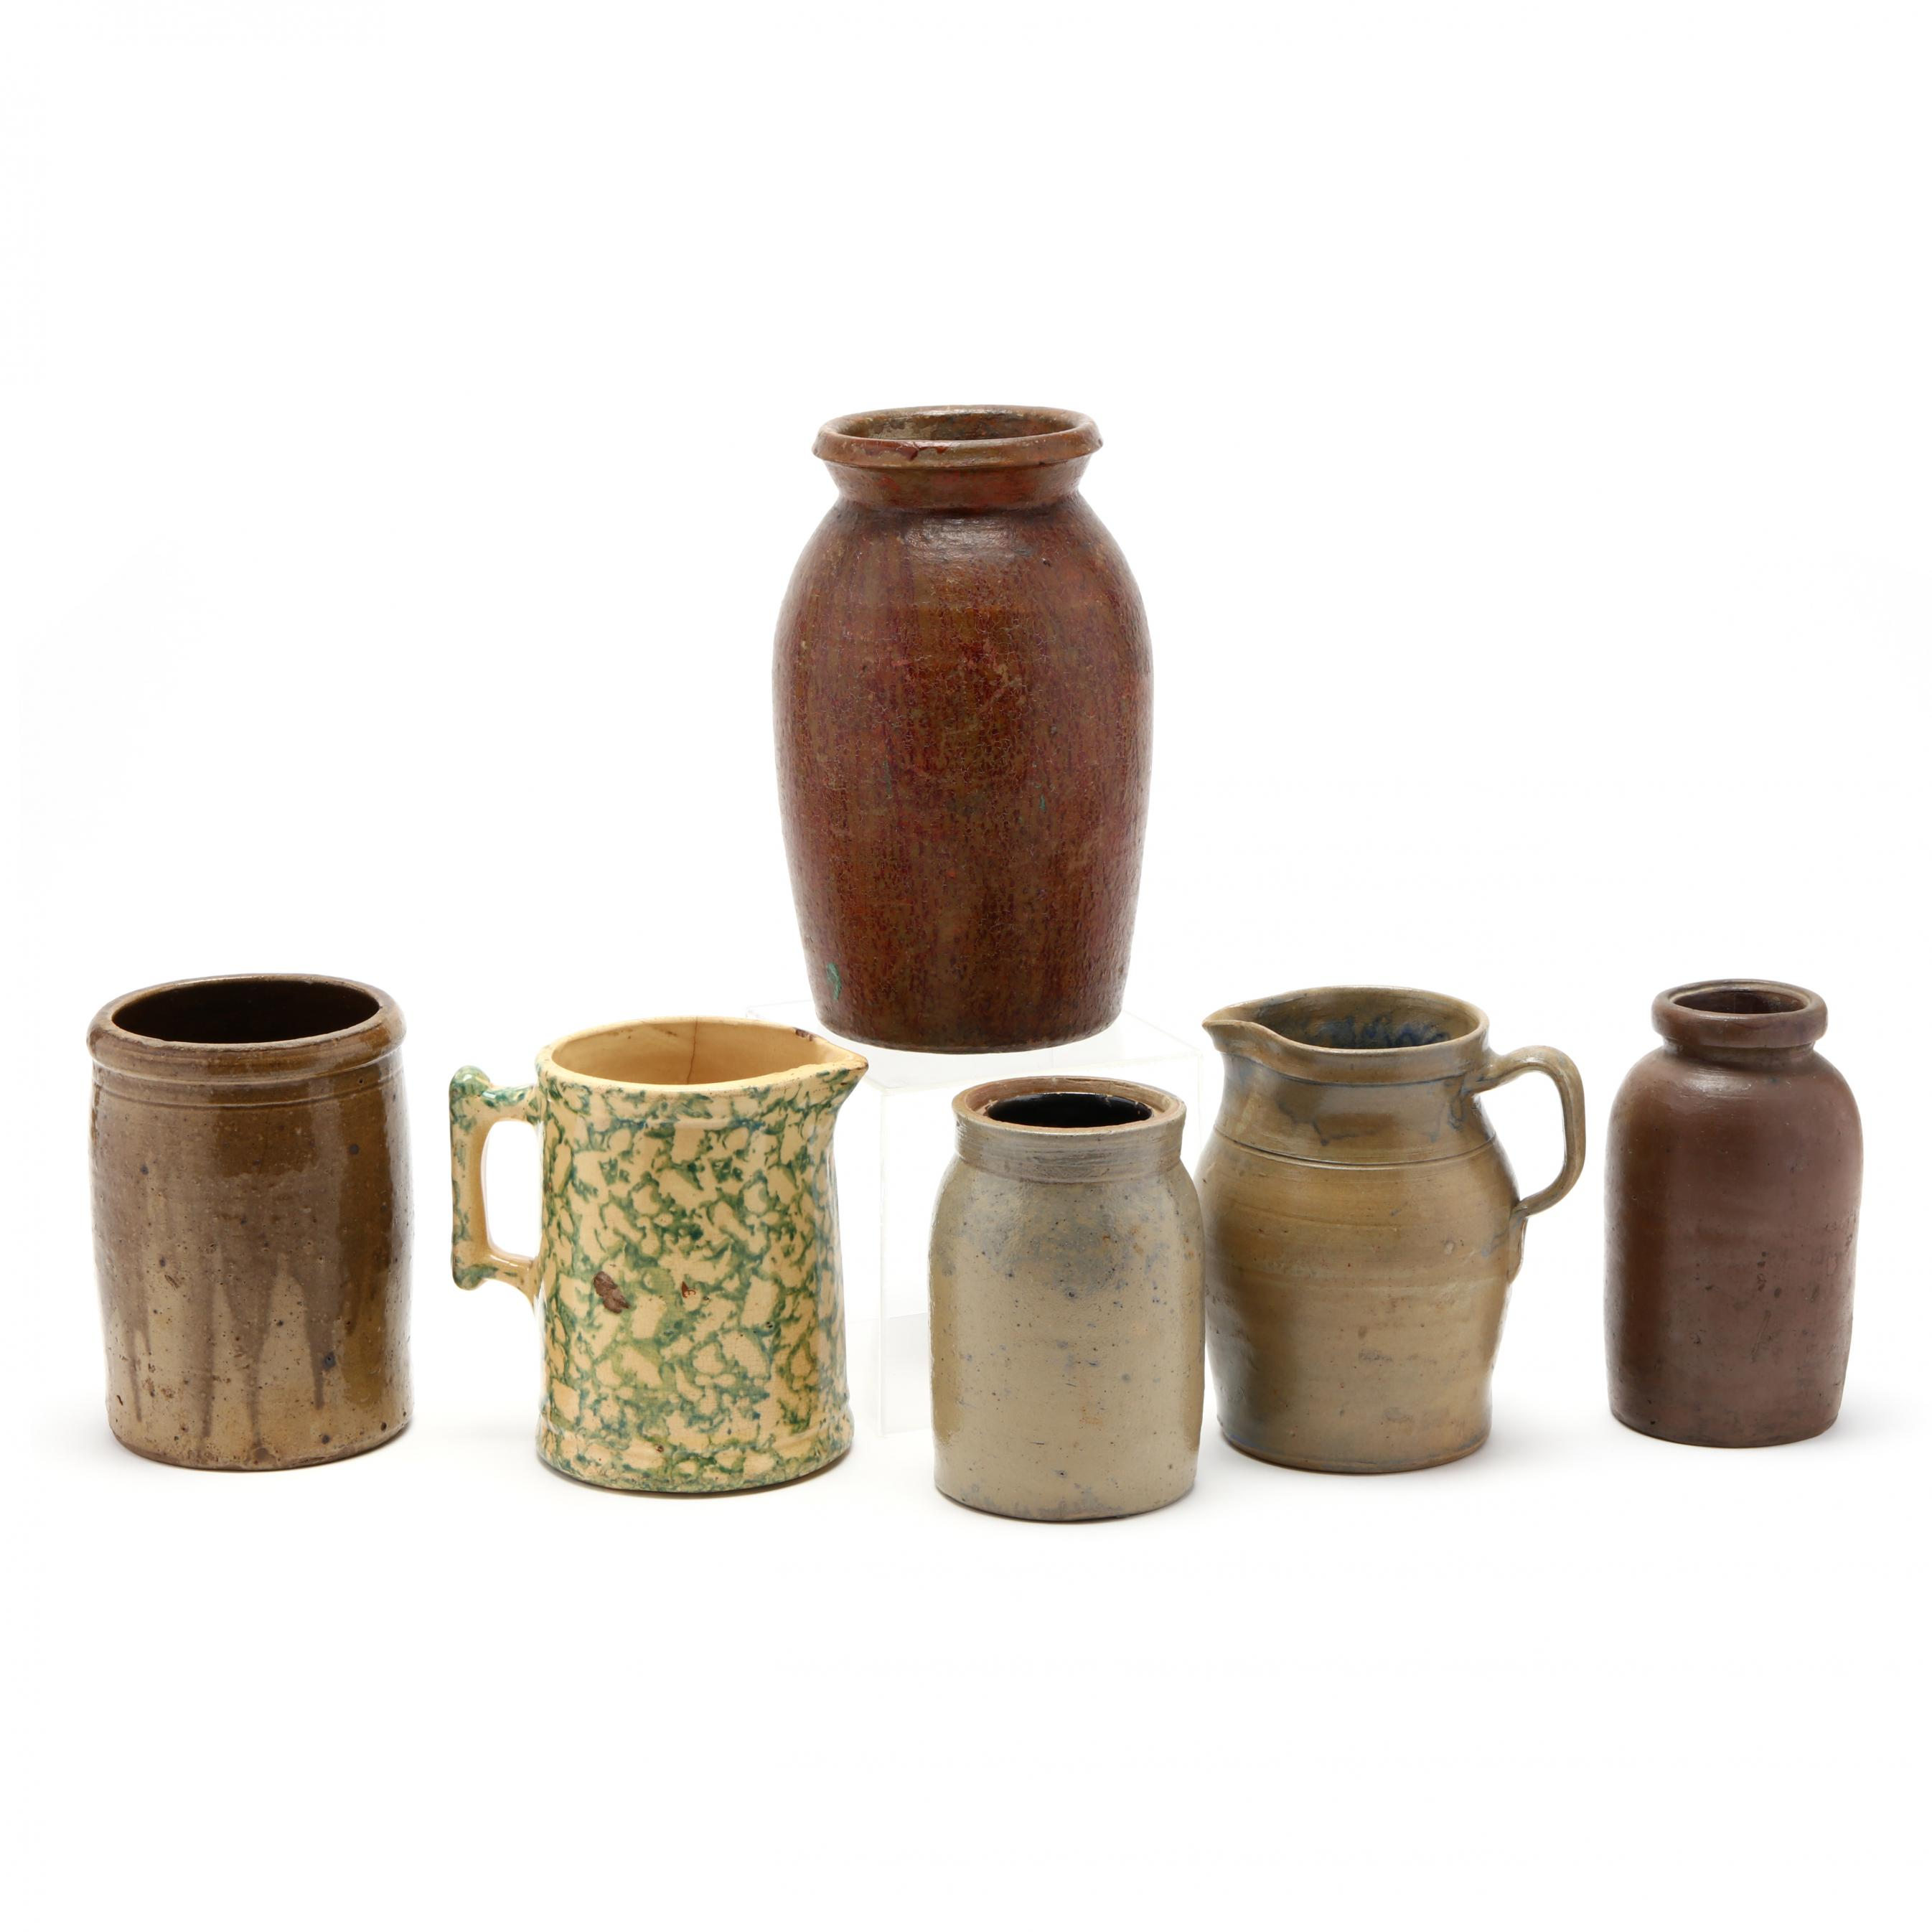 six-pieces-antique-stoneware